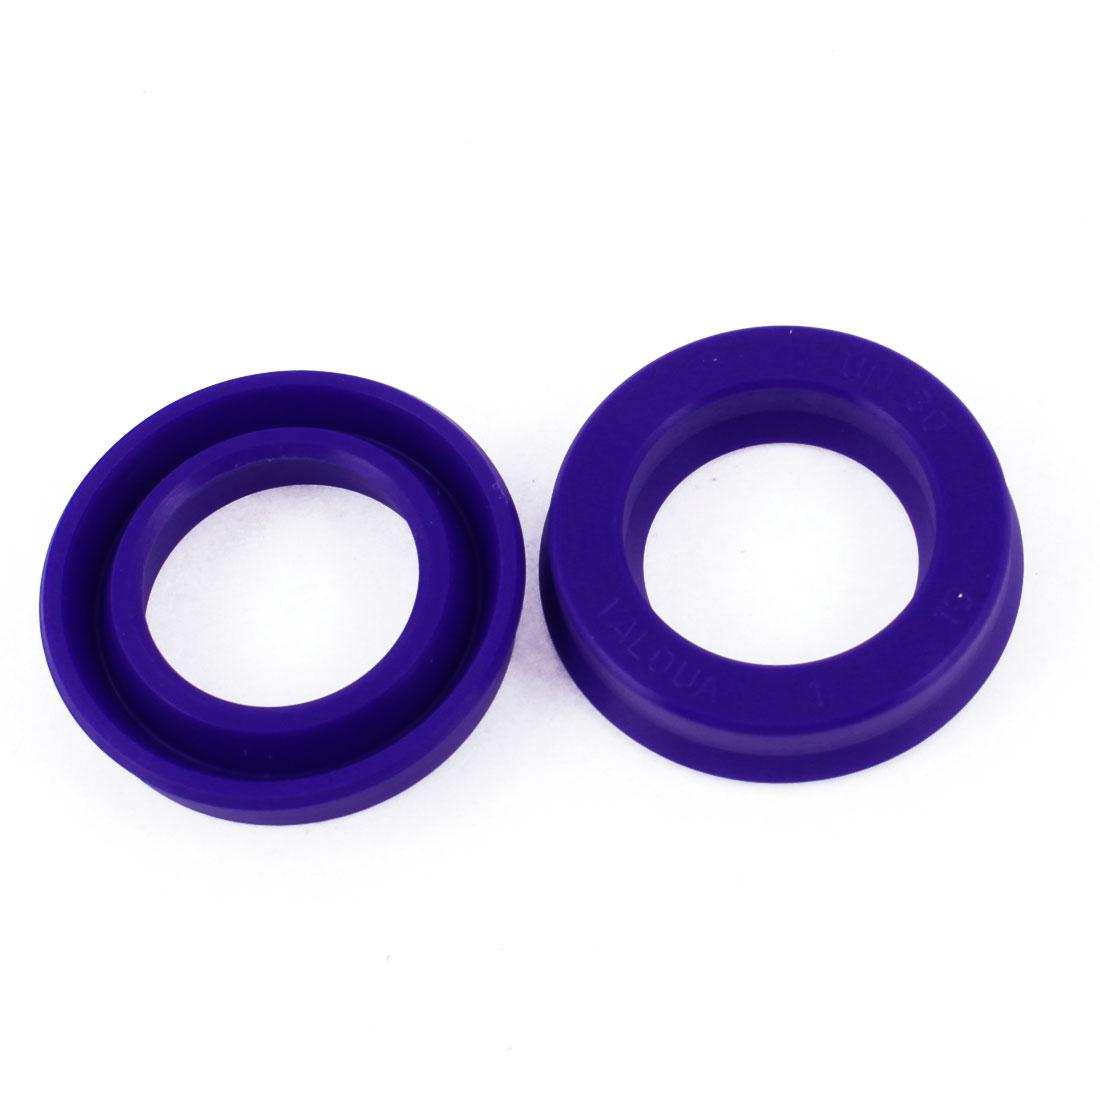 2 Pcs Blue PU 30mm x 45mm x 10mm Double Lip Sealing Dust Oil Seal